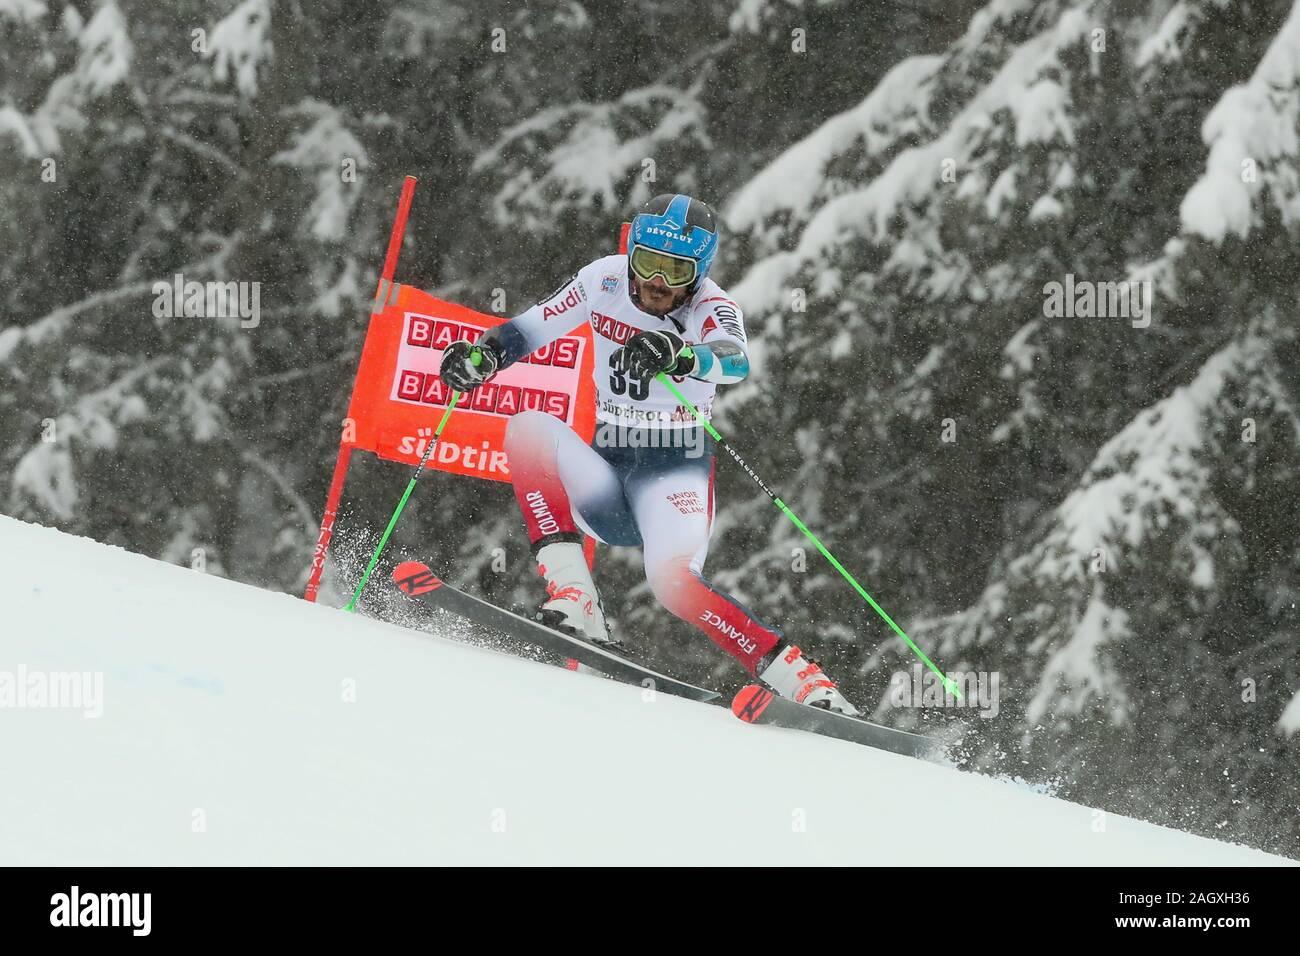 Alta Badia, Italy. 22nd Dec, 2019. sarrazin cyprien (fra) second classifiedduring FIS SKI WORLD CUP 2019 - Giant Slalom Men, Ski in Alta Badia, Italy, December 22 2019 - LPS/Sergio Bisi Credit: Sergio Bisi/LPS/ZUMA Wire/Alamy Live News Stock Photo